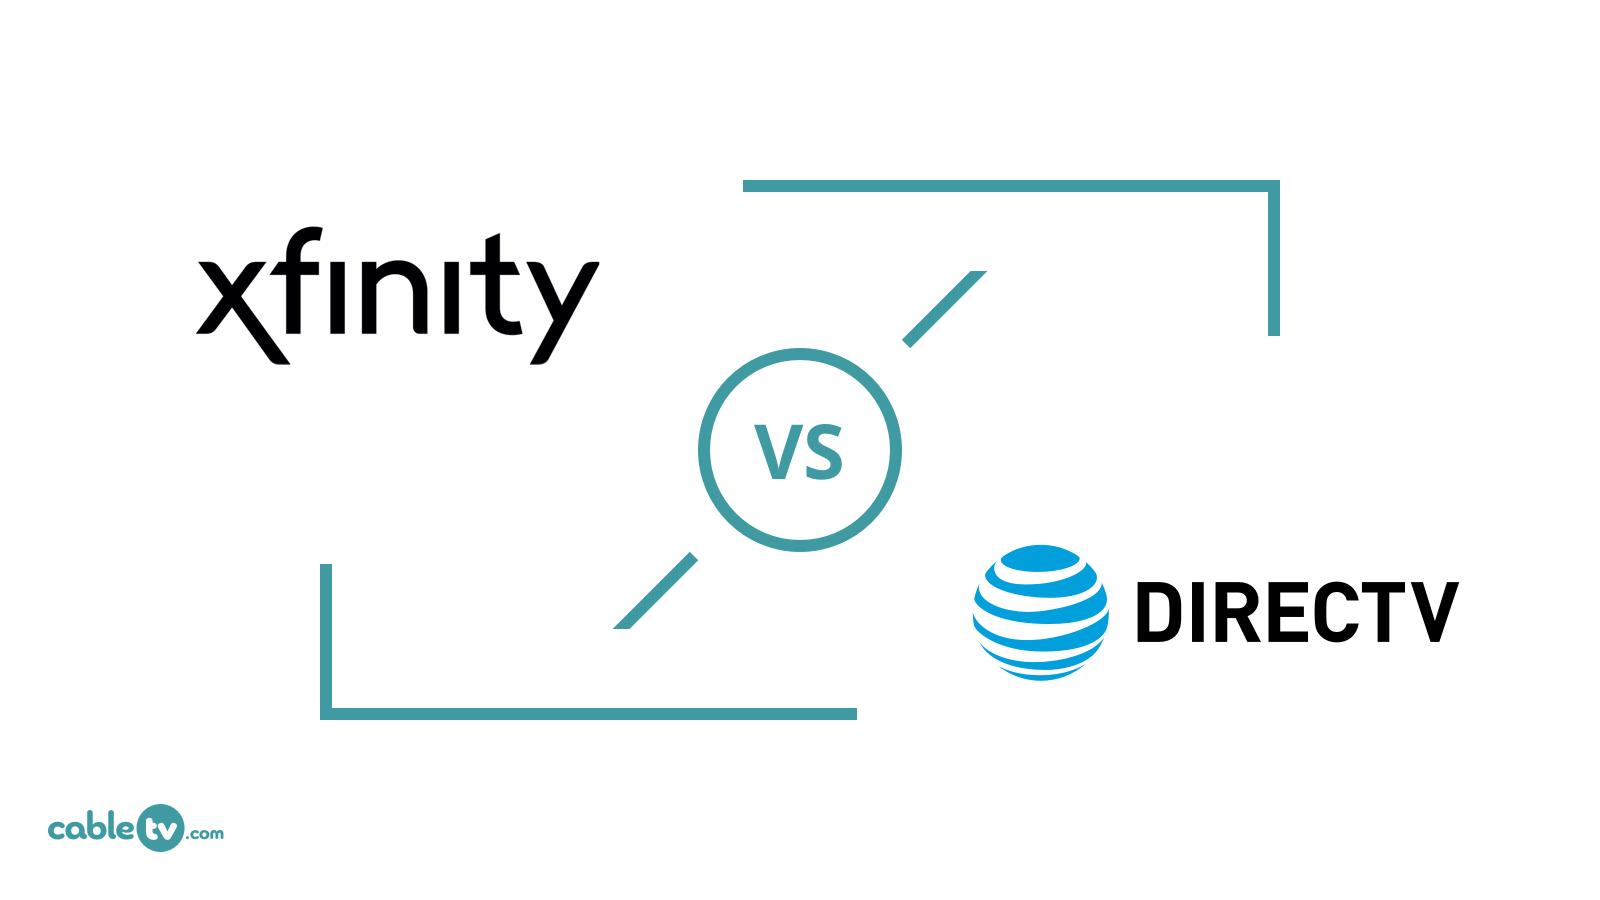 Xfinity vs. DIRECTV